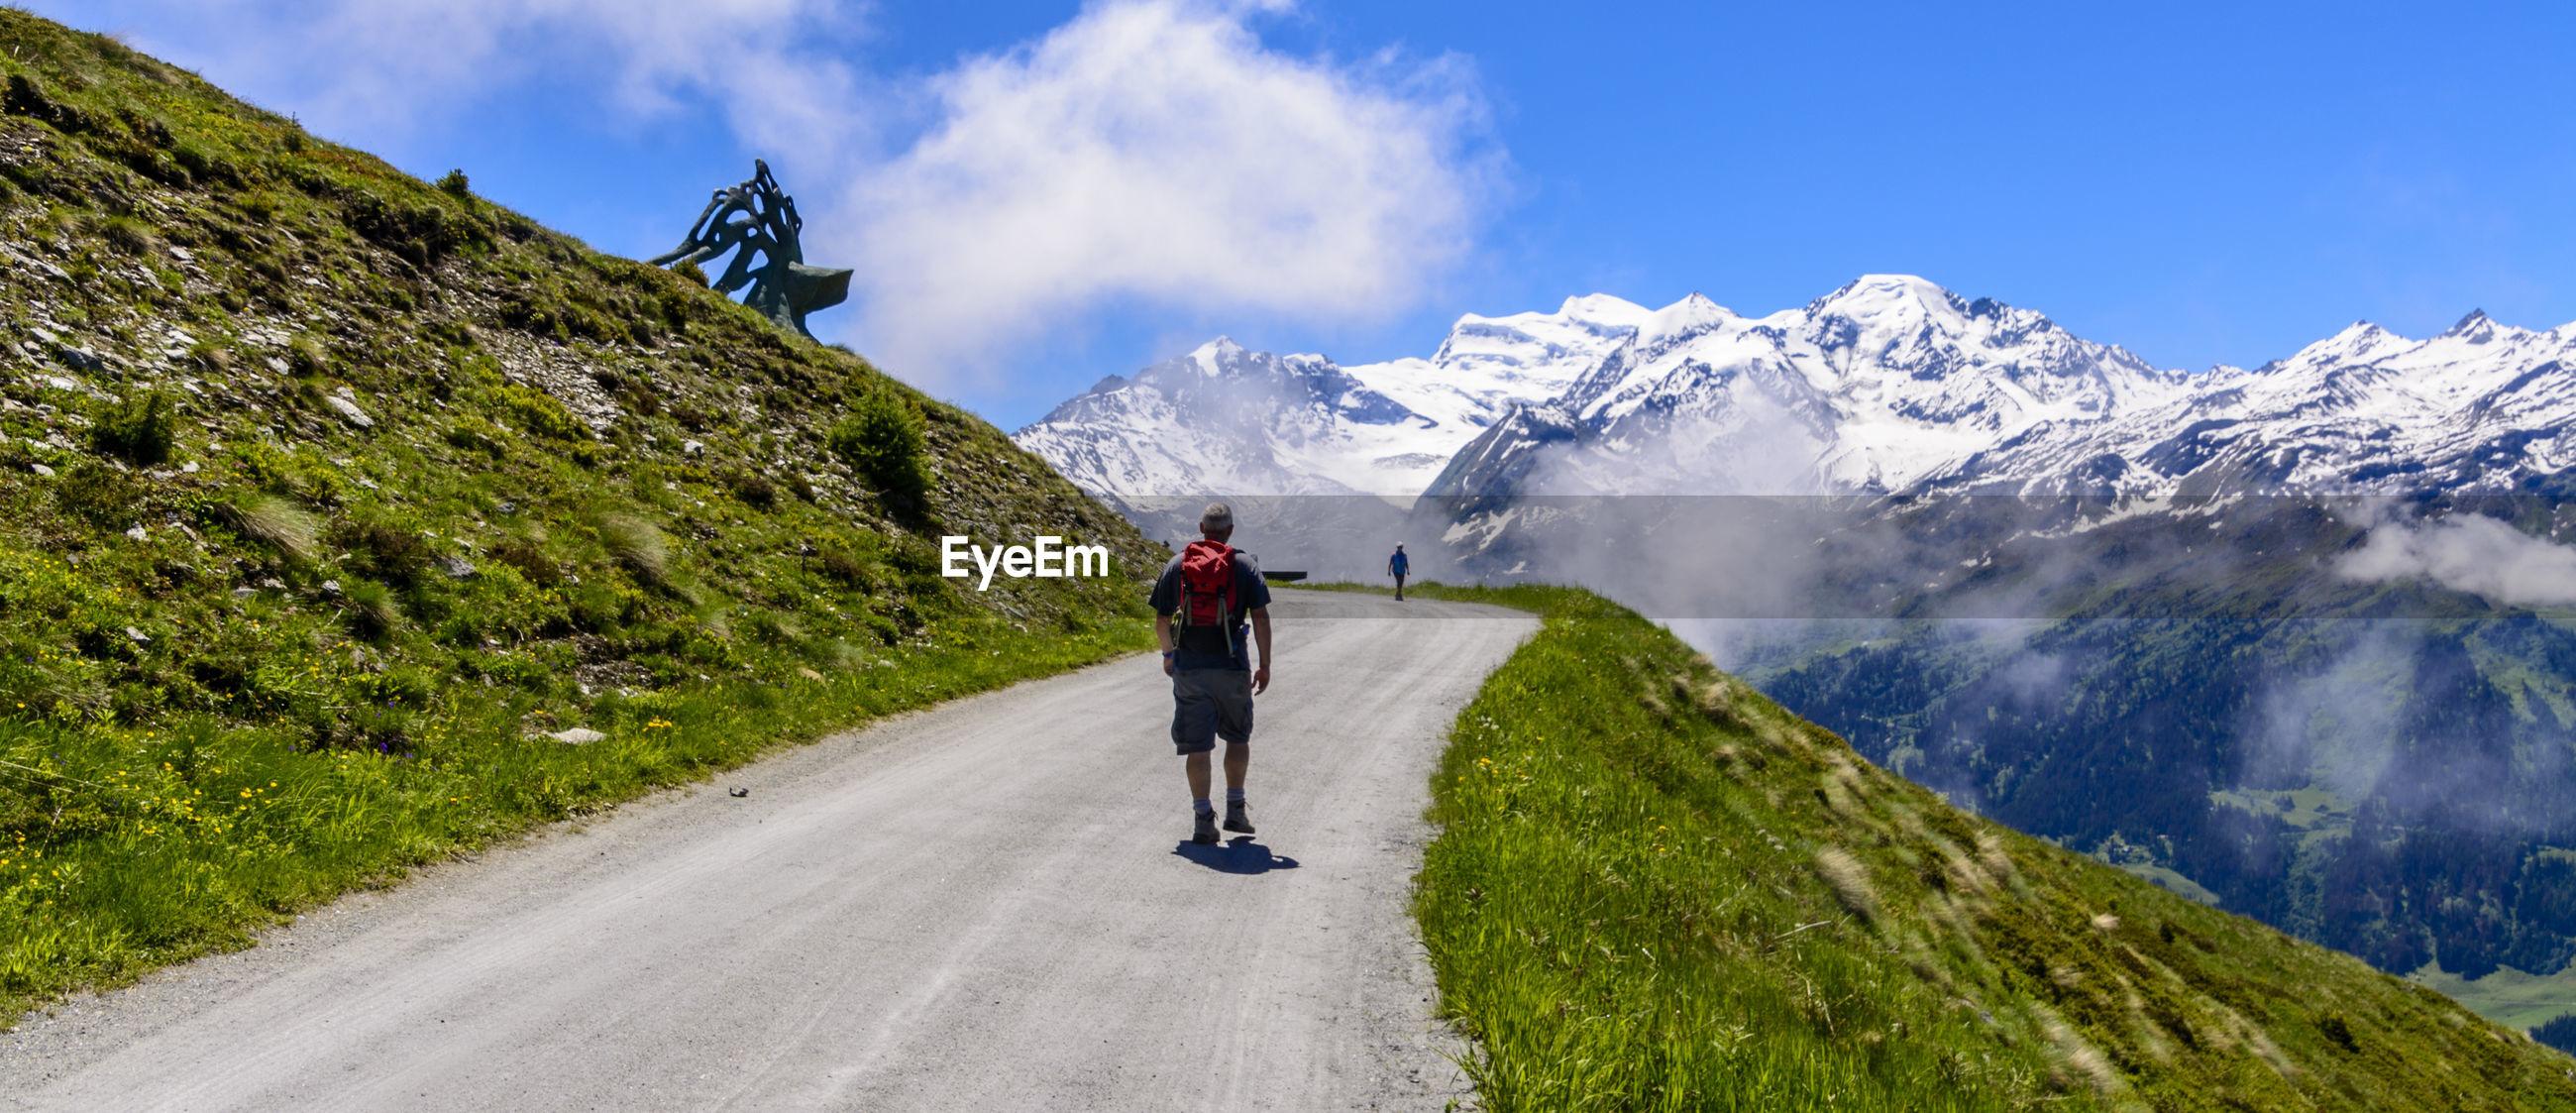 Full length of man on road in mountain landscape against sky